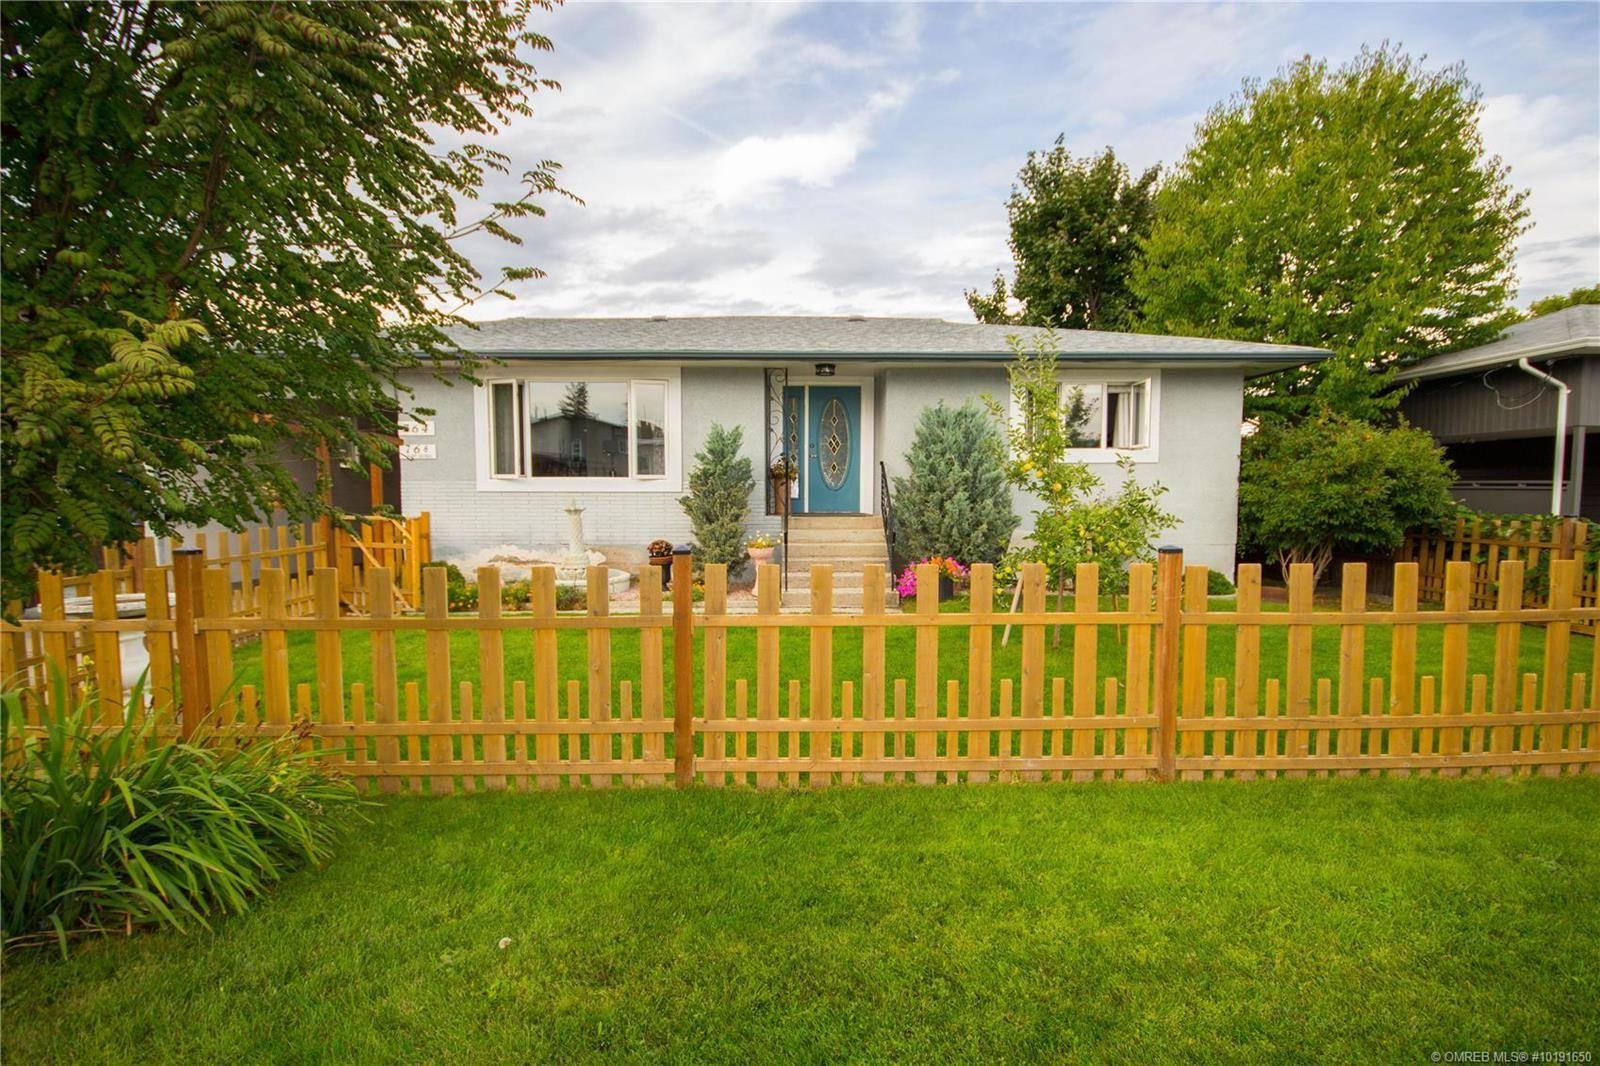 House for sale at 764 Francis Ave Kelowna British Columbia - MLS: 10191650